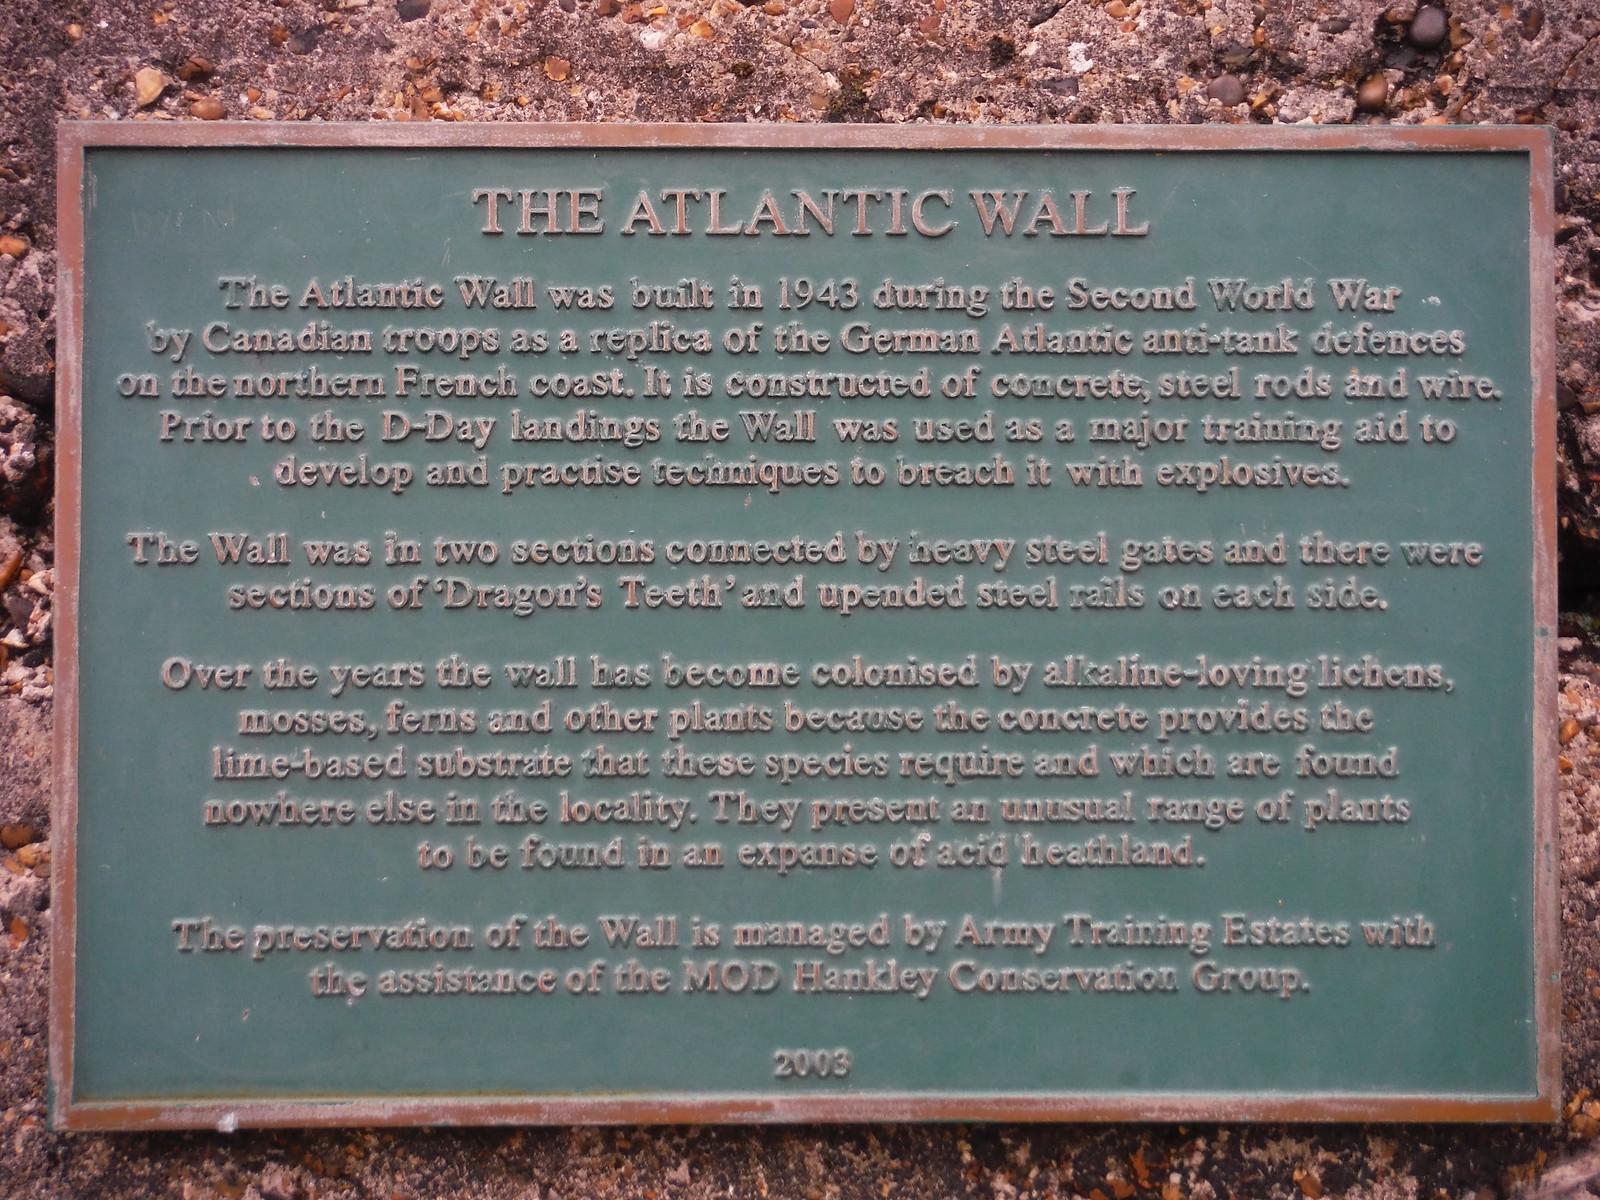 Explanatory Plaque, The Atlantic Wall, Hankley Common SWC Walk 144 Haslemere to Farnham - Atlantic Wall Extension